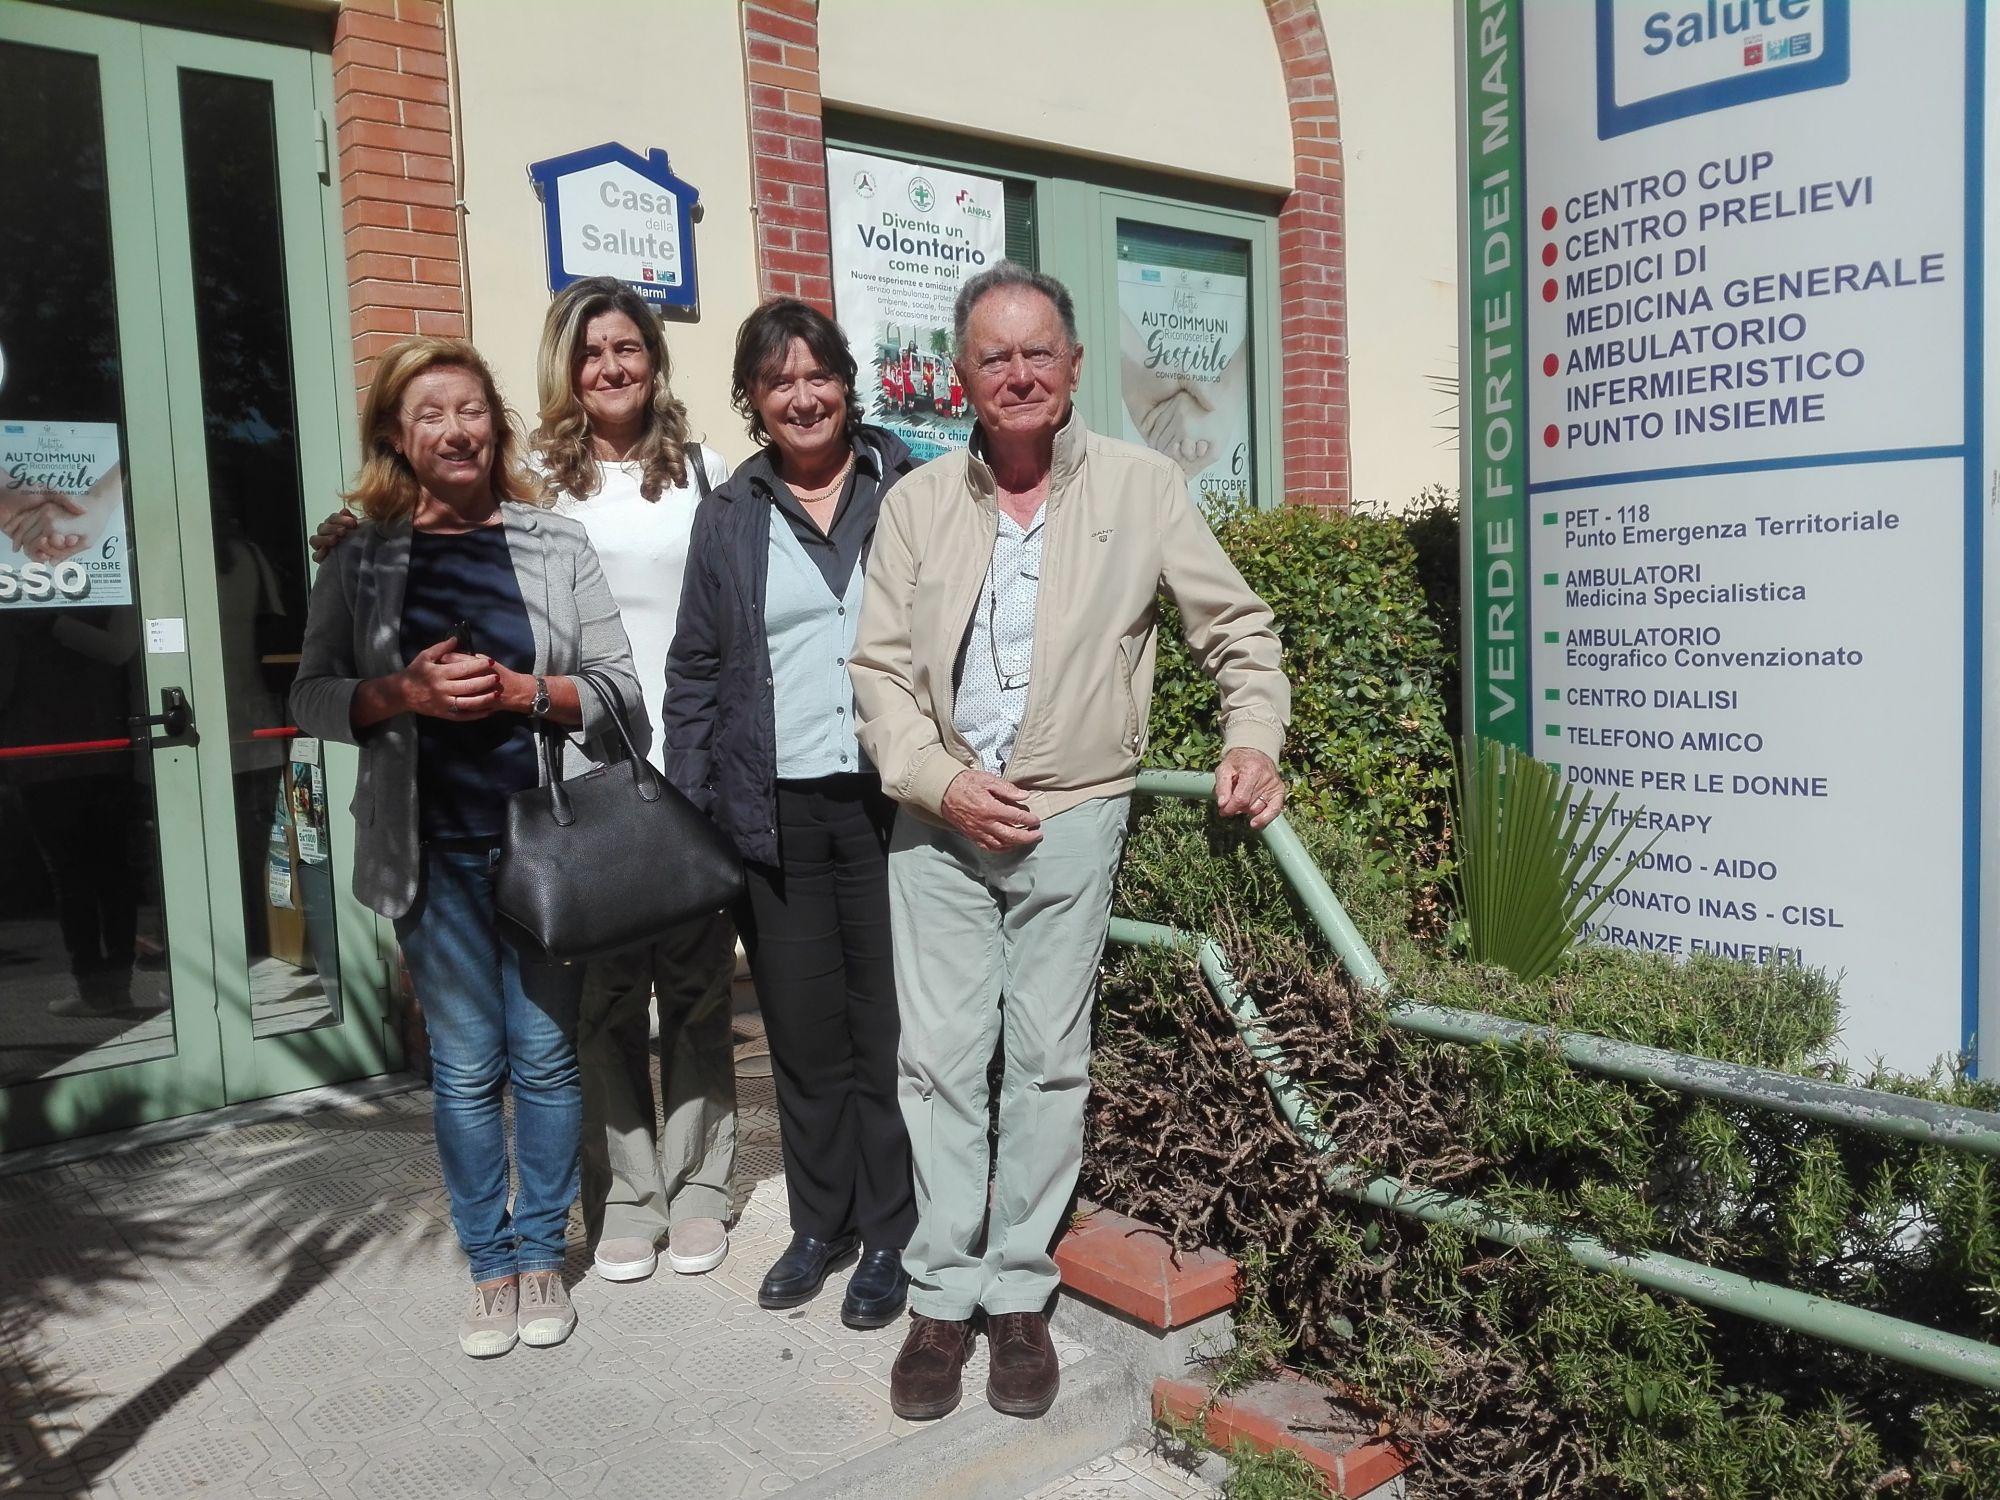 L'assessore Stefania Saccardi in visita alla Croce Verde di Forte dei Marmi